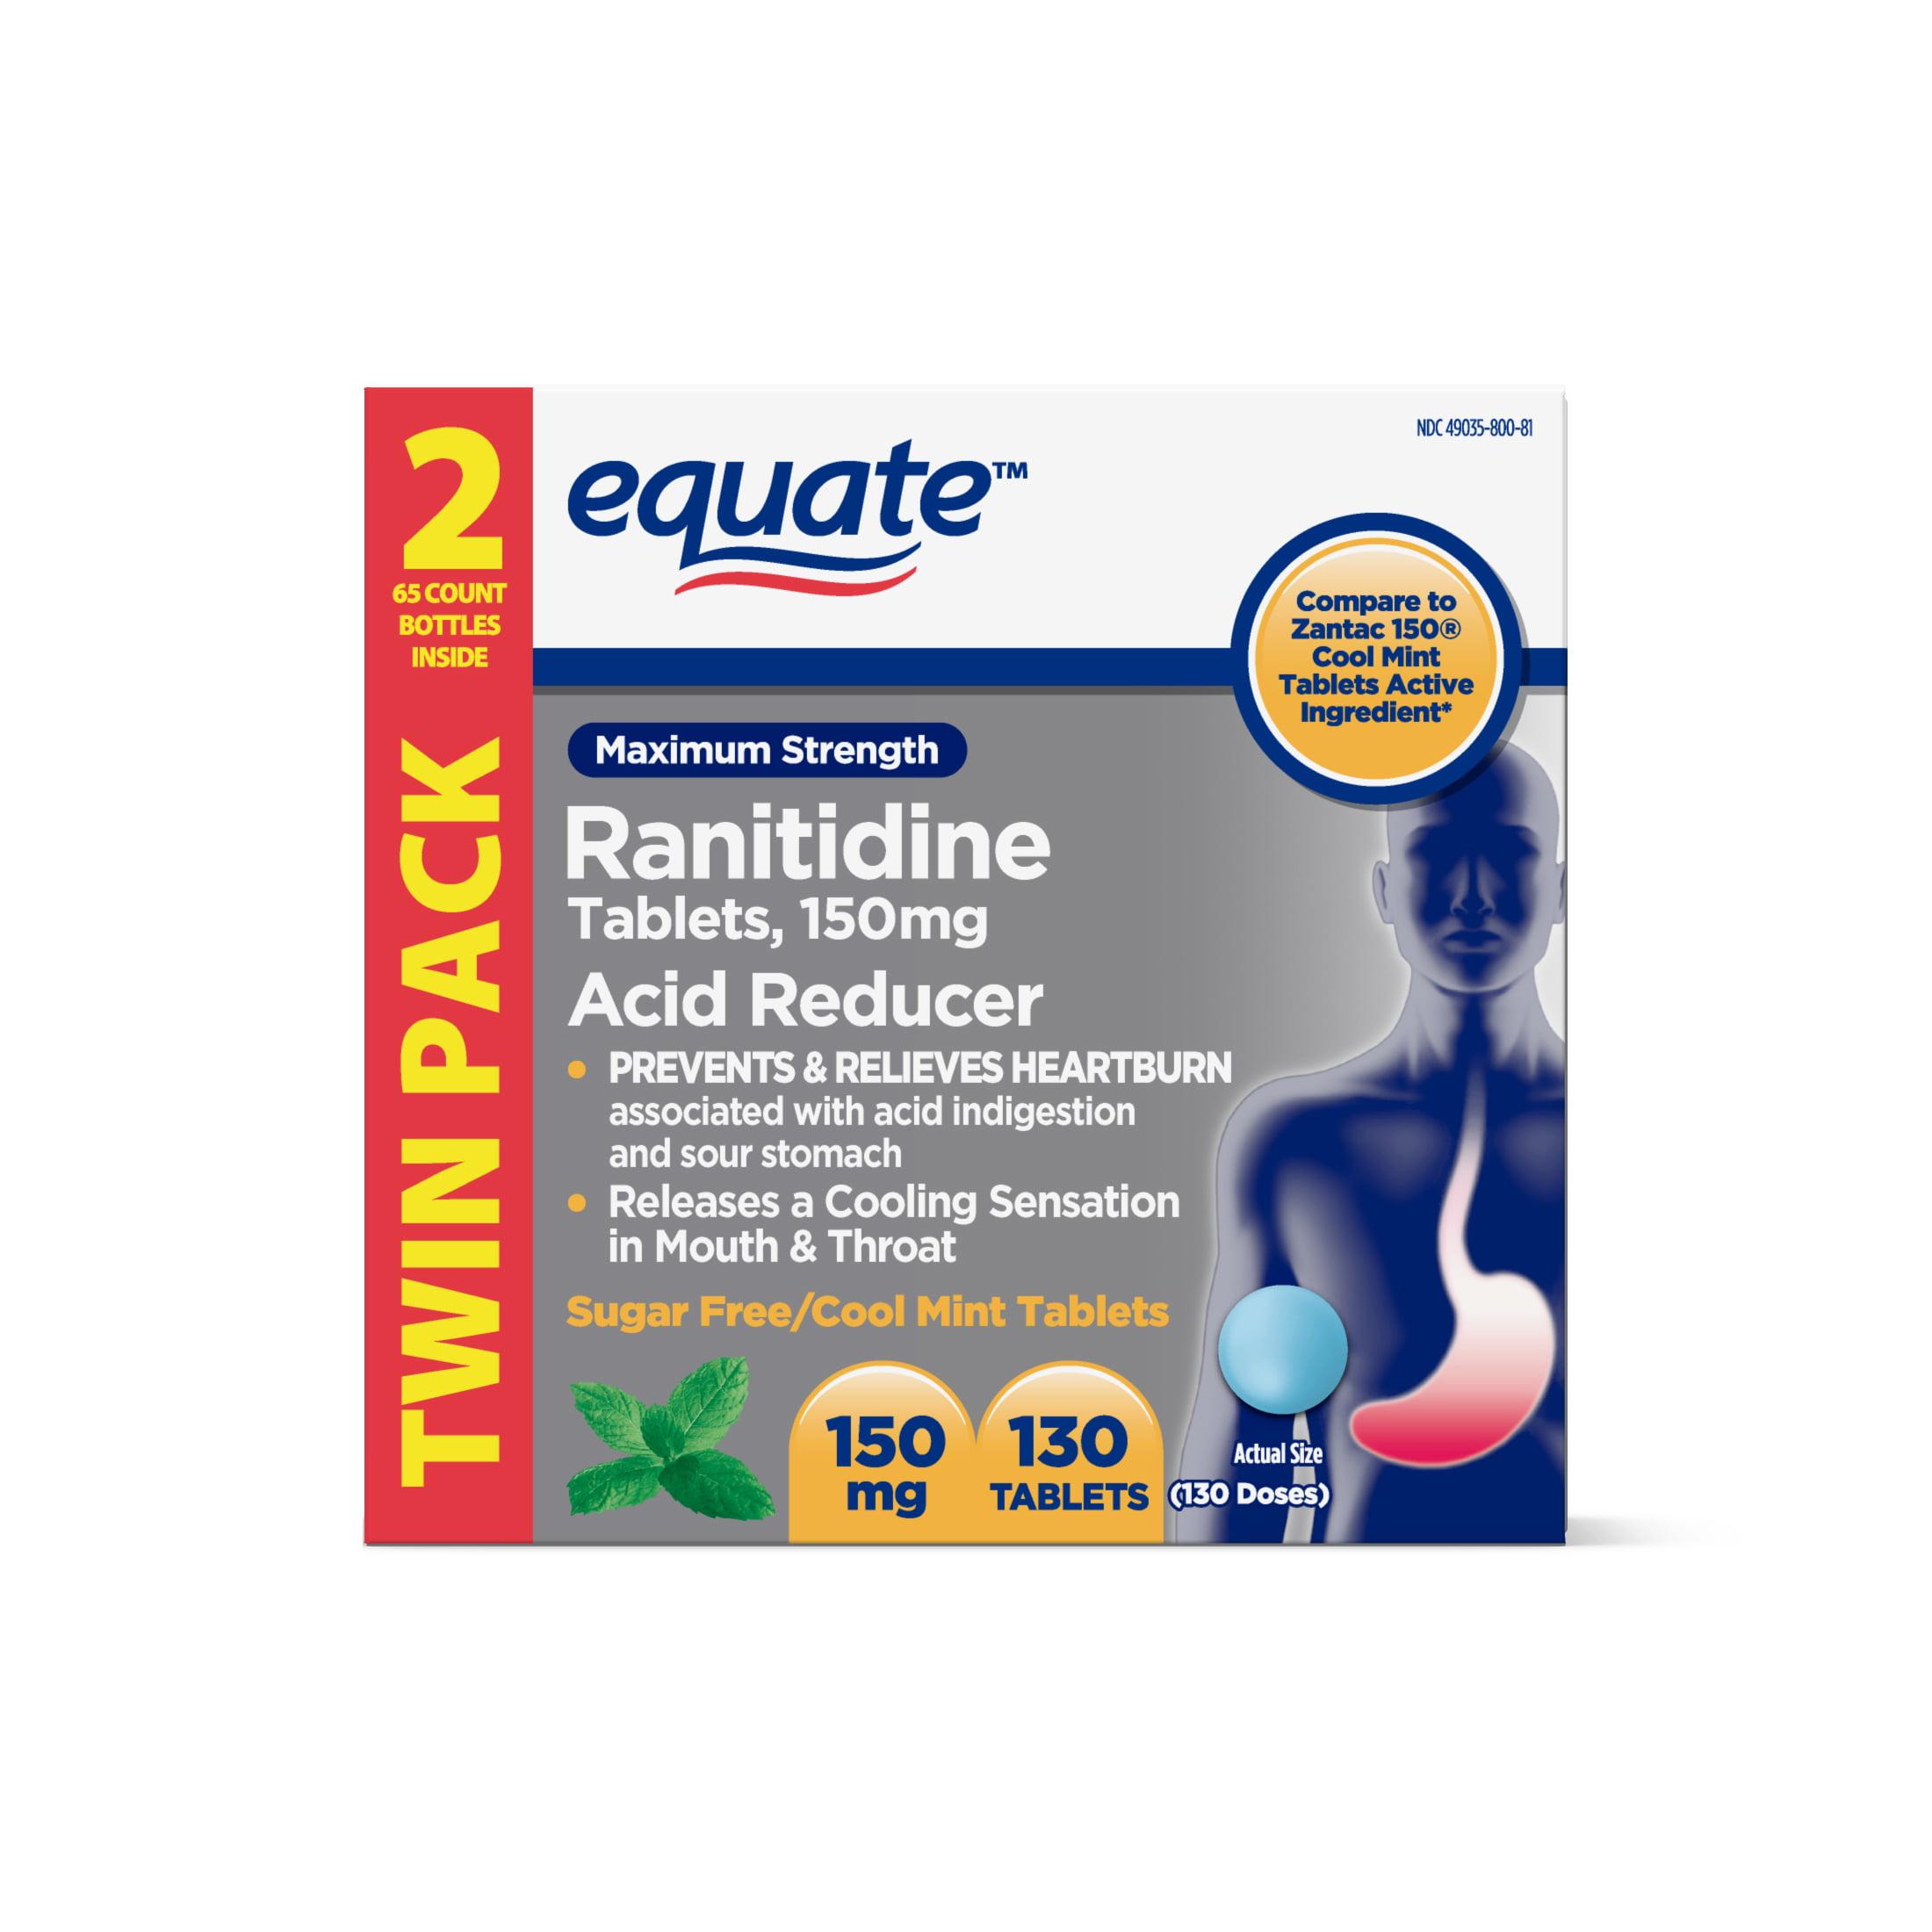 Equate Ranitidine Acid Reducer Cool Mint Tablets, 150mg, 2PK (65 ea.)